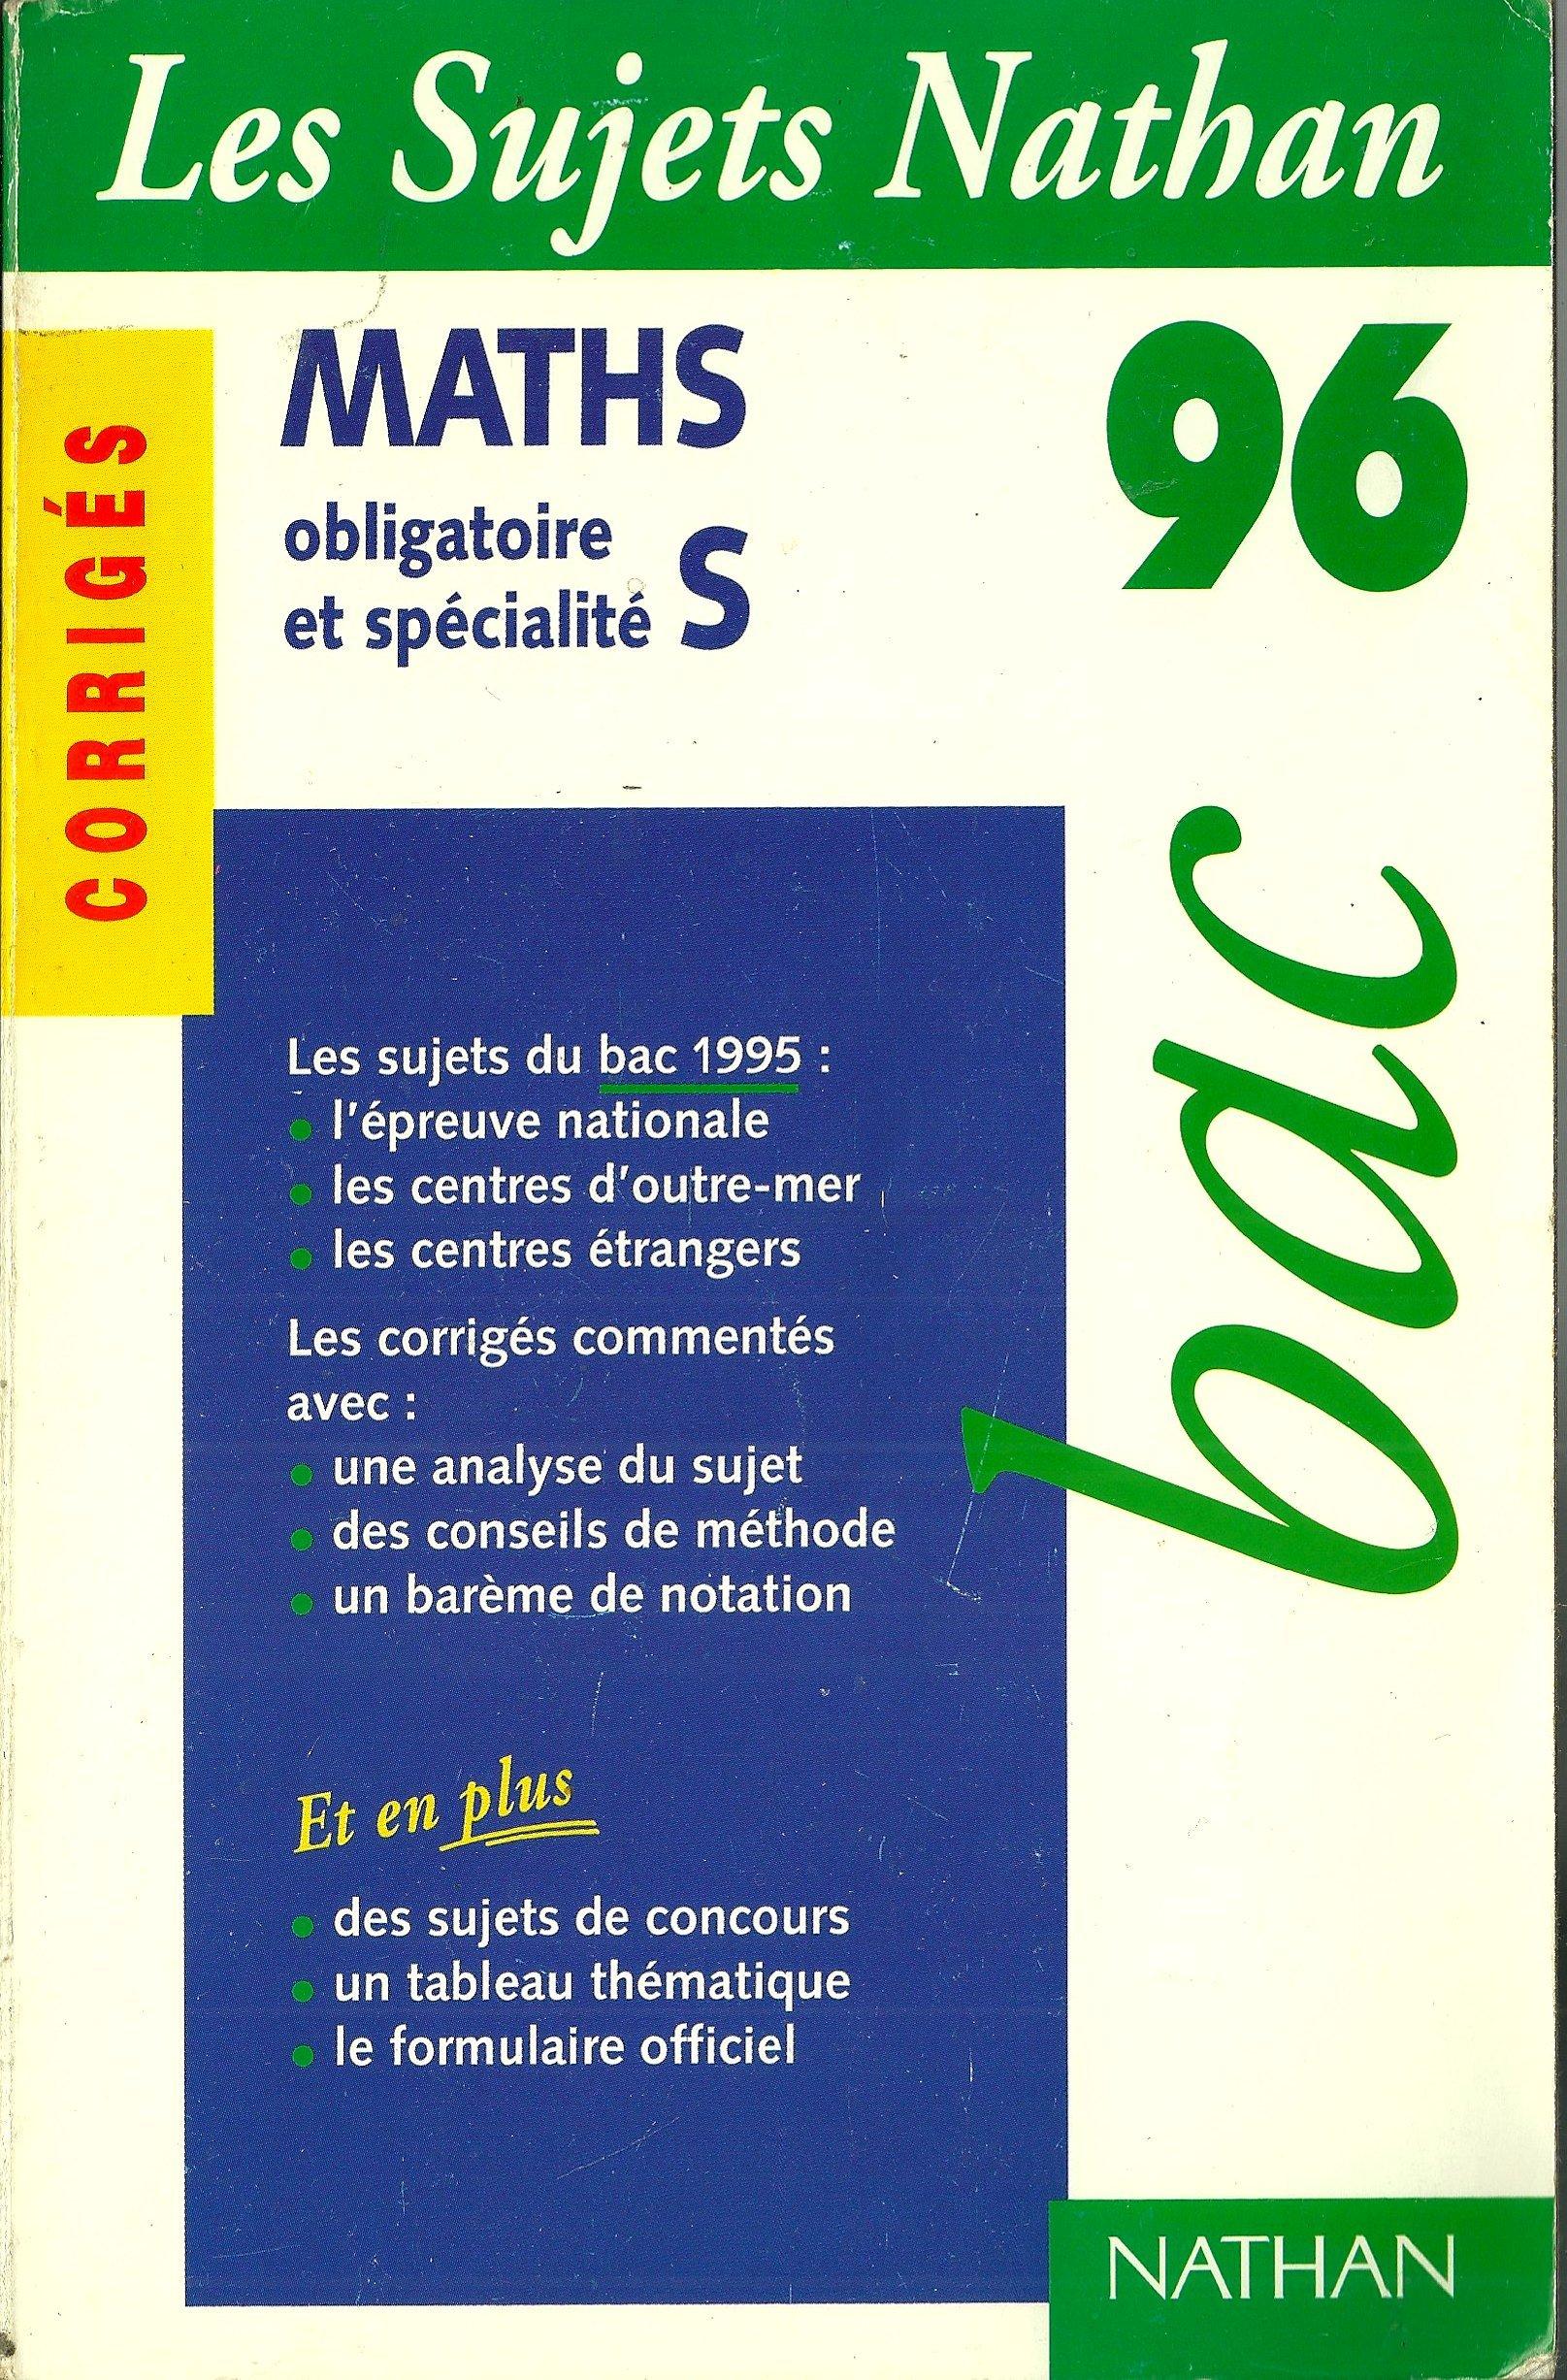 BAC 96, LES SUJETS NATHAN, MATHS OBLIGATOIRE ET SPECIALITE S, CORRIGES, SUJETS DU BAC 1995 (French) Paperback – 1996